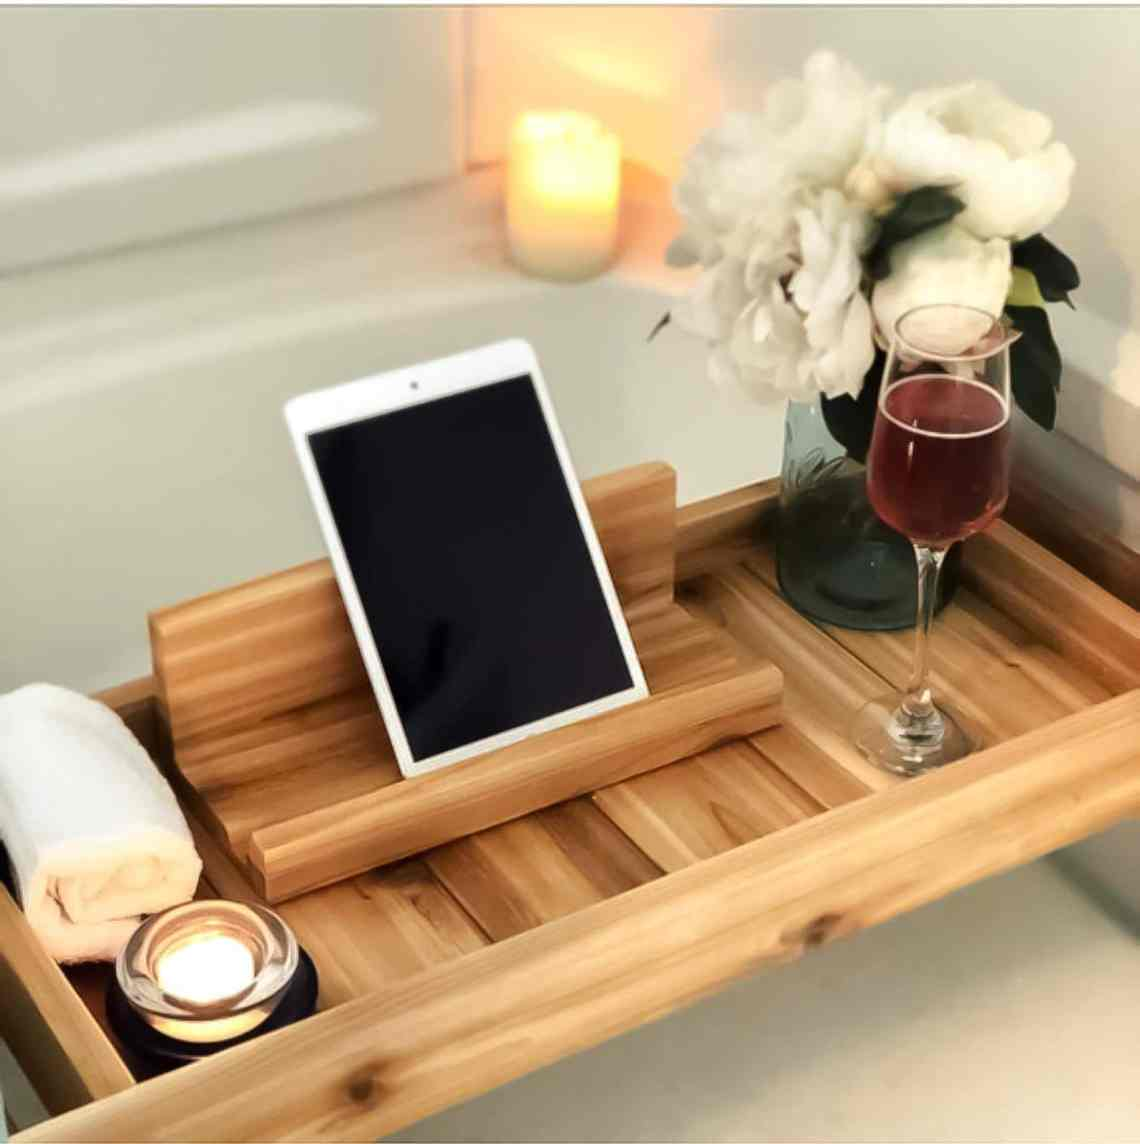 best gifts for her cedar bath tray